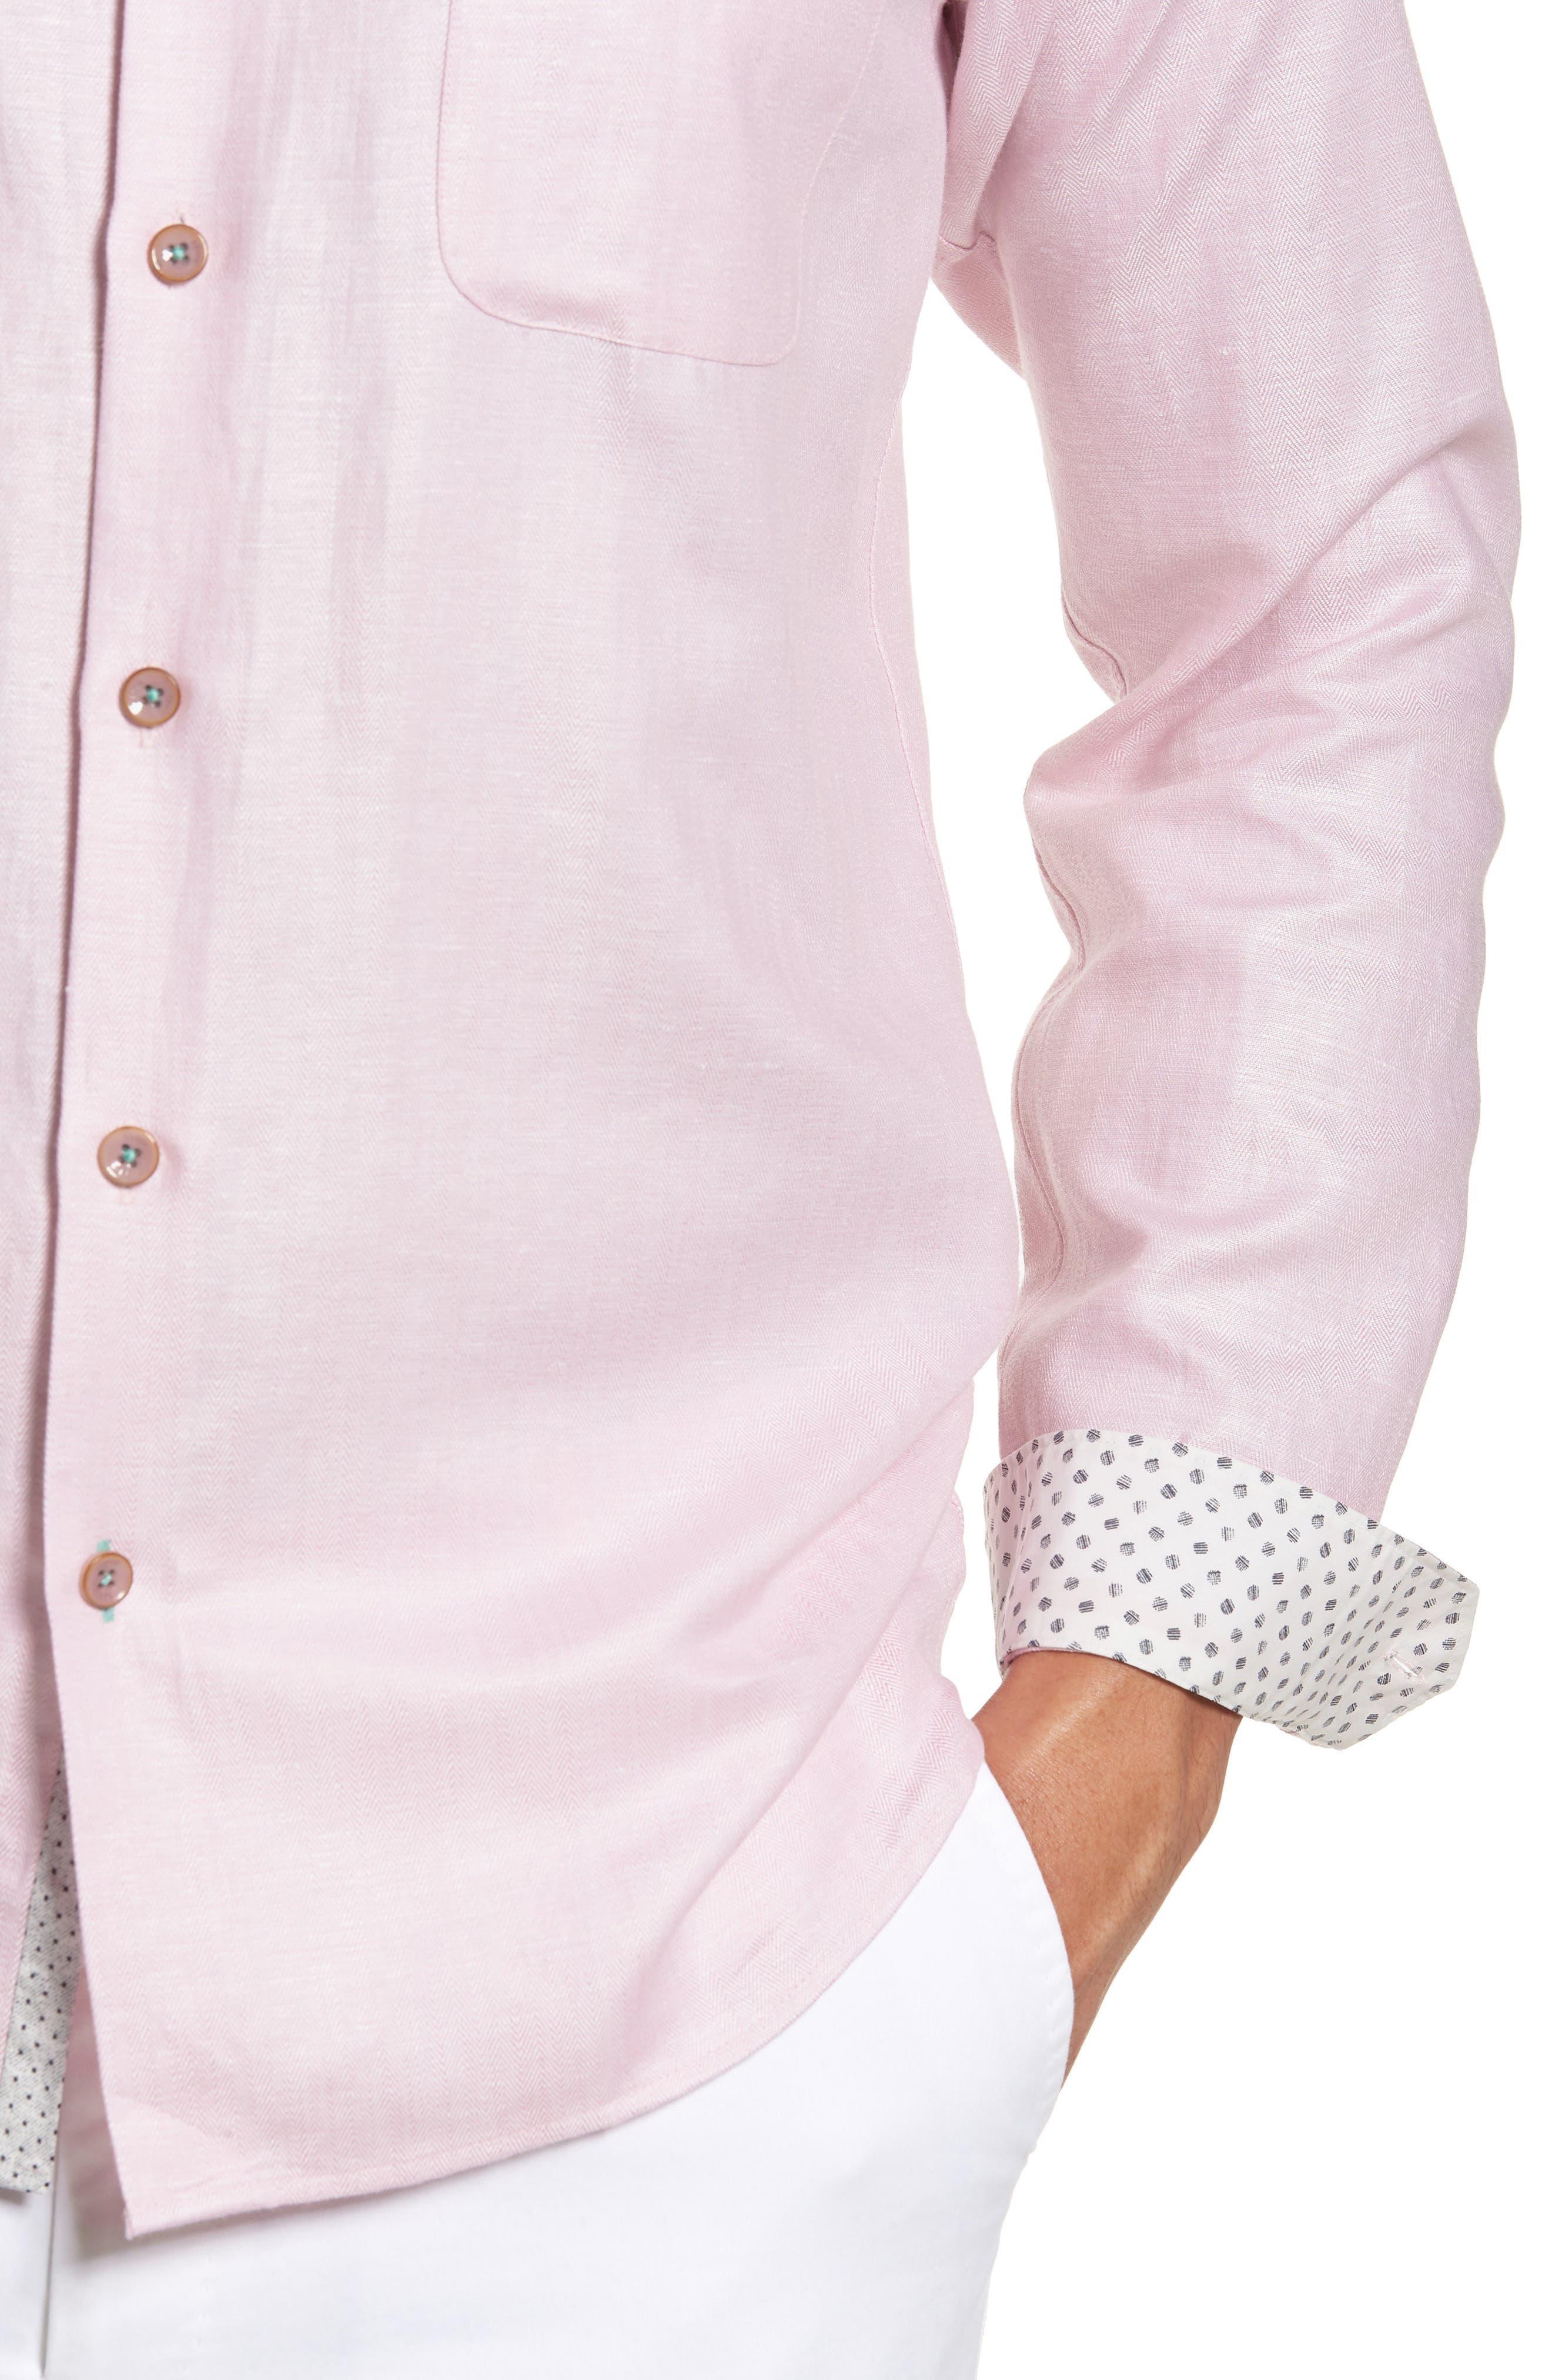 Linlins Herringbone Cotton & Linen Sport Shirt,                             Alternate thumbnail 20, color,